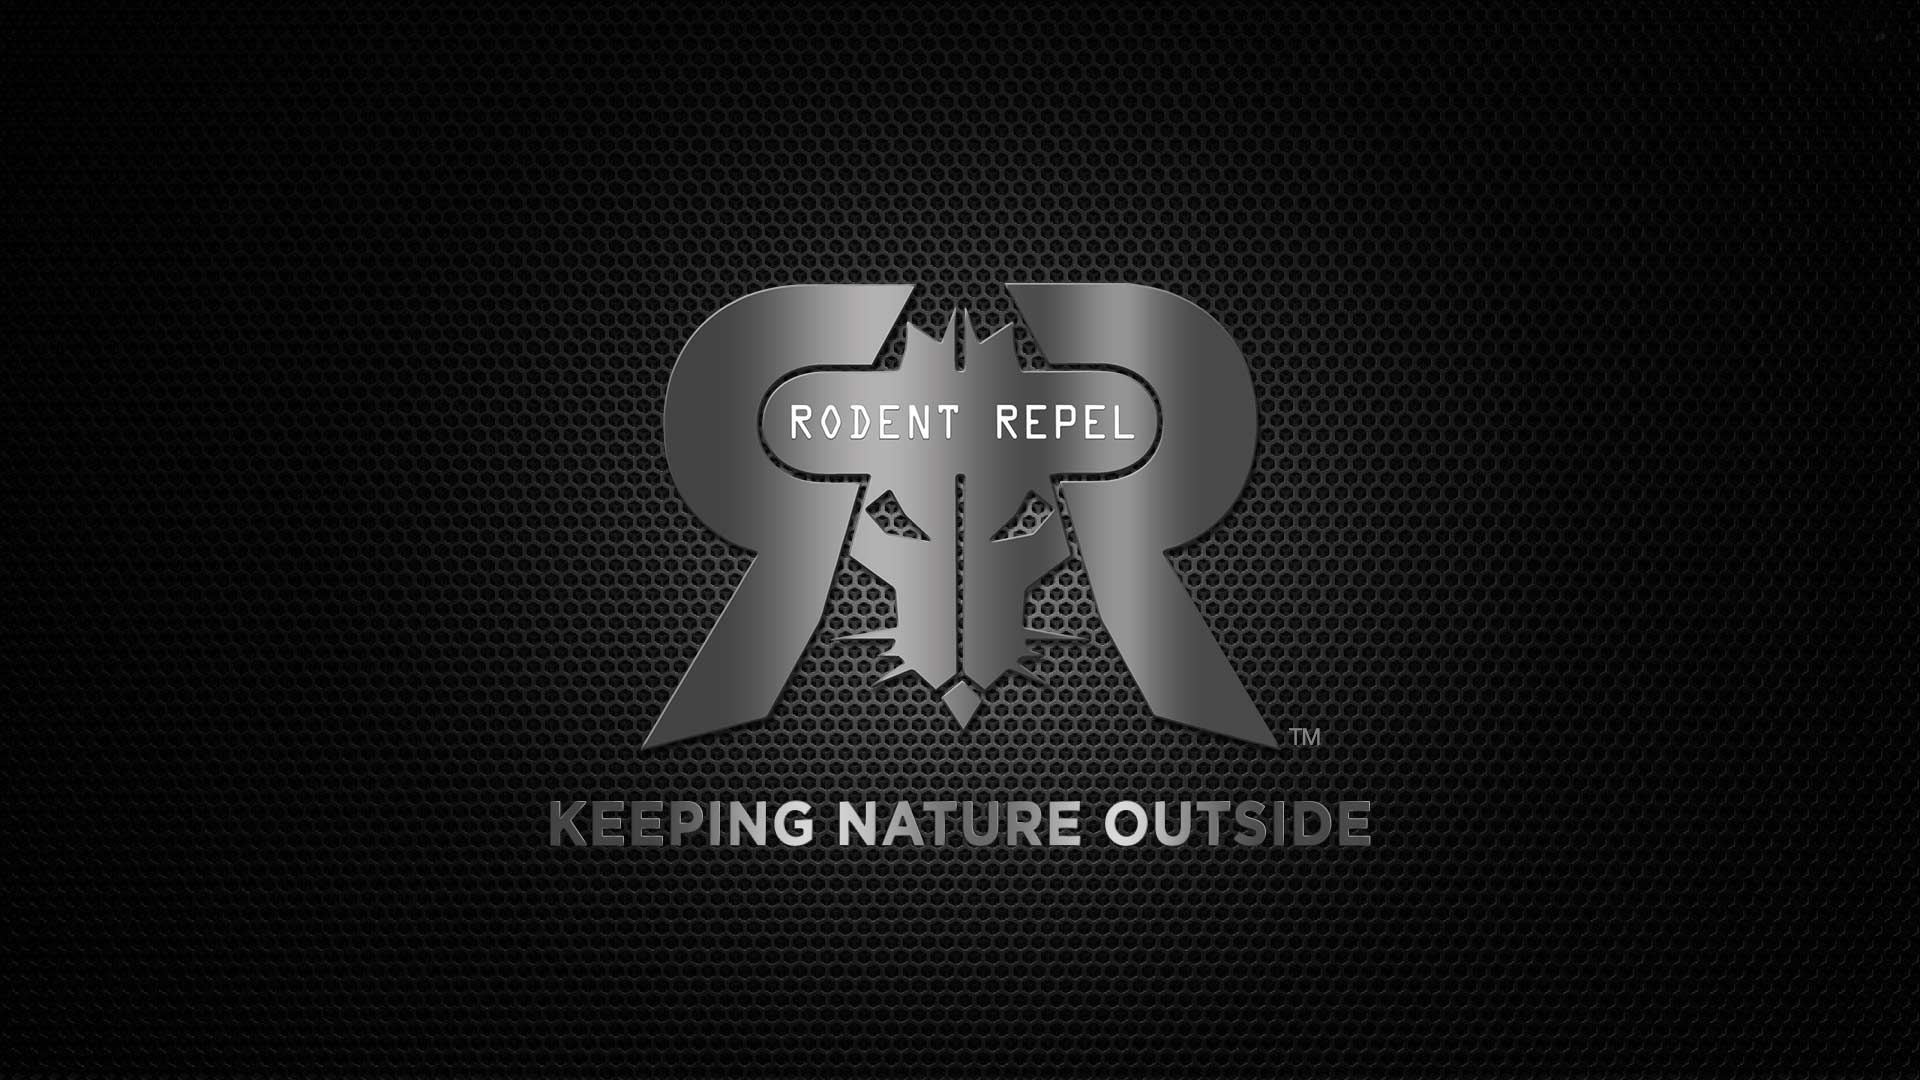 KEEPING NATURE OUTSIDE